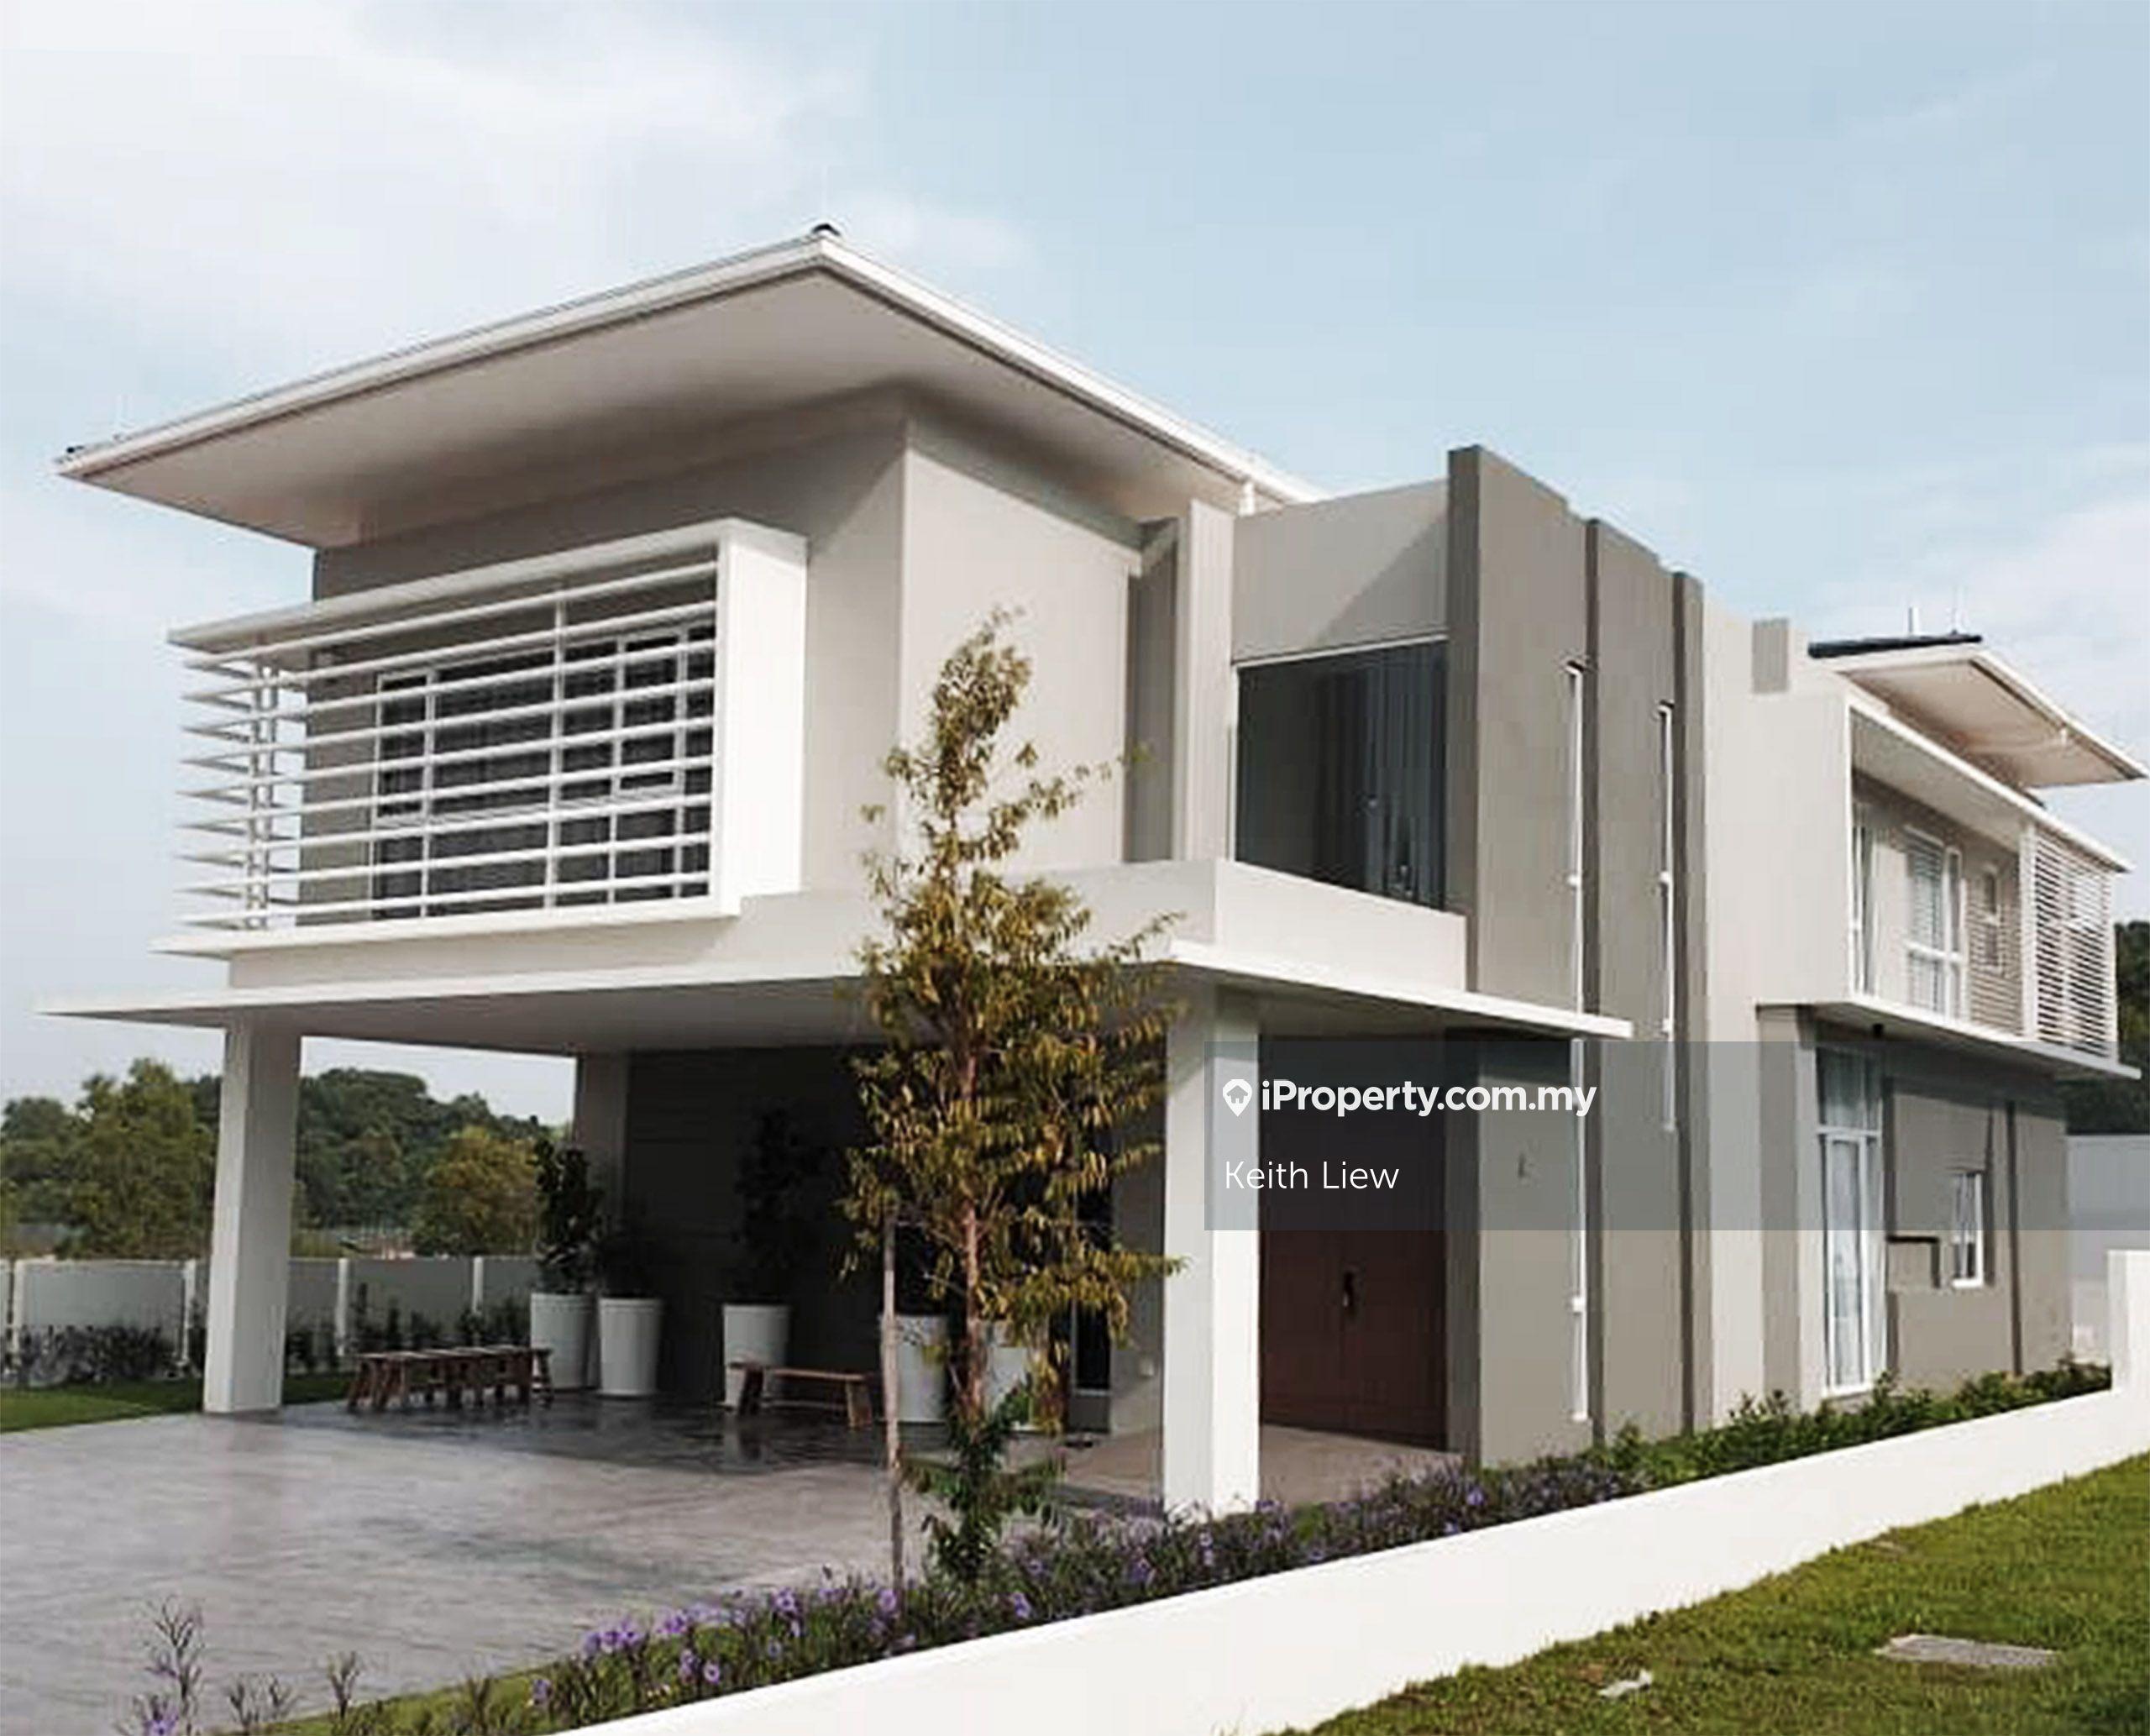 Celestial Mansion (Bungalow) - Jade Hill, Kajang